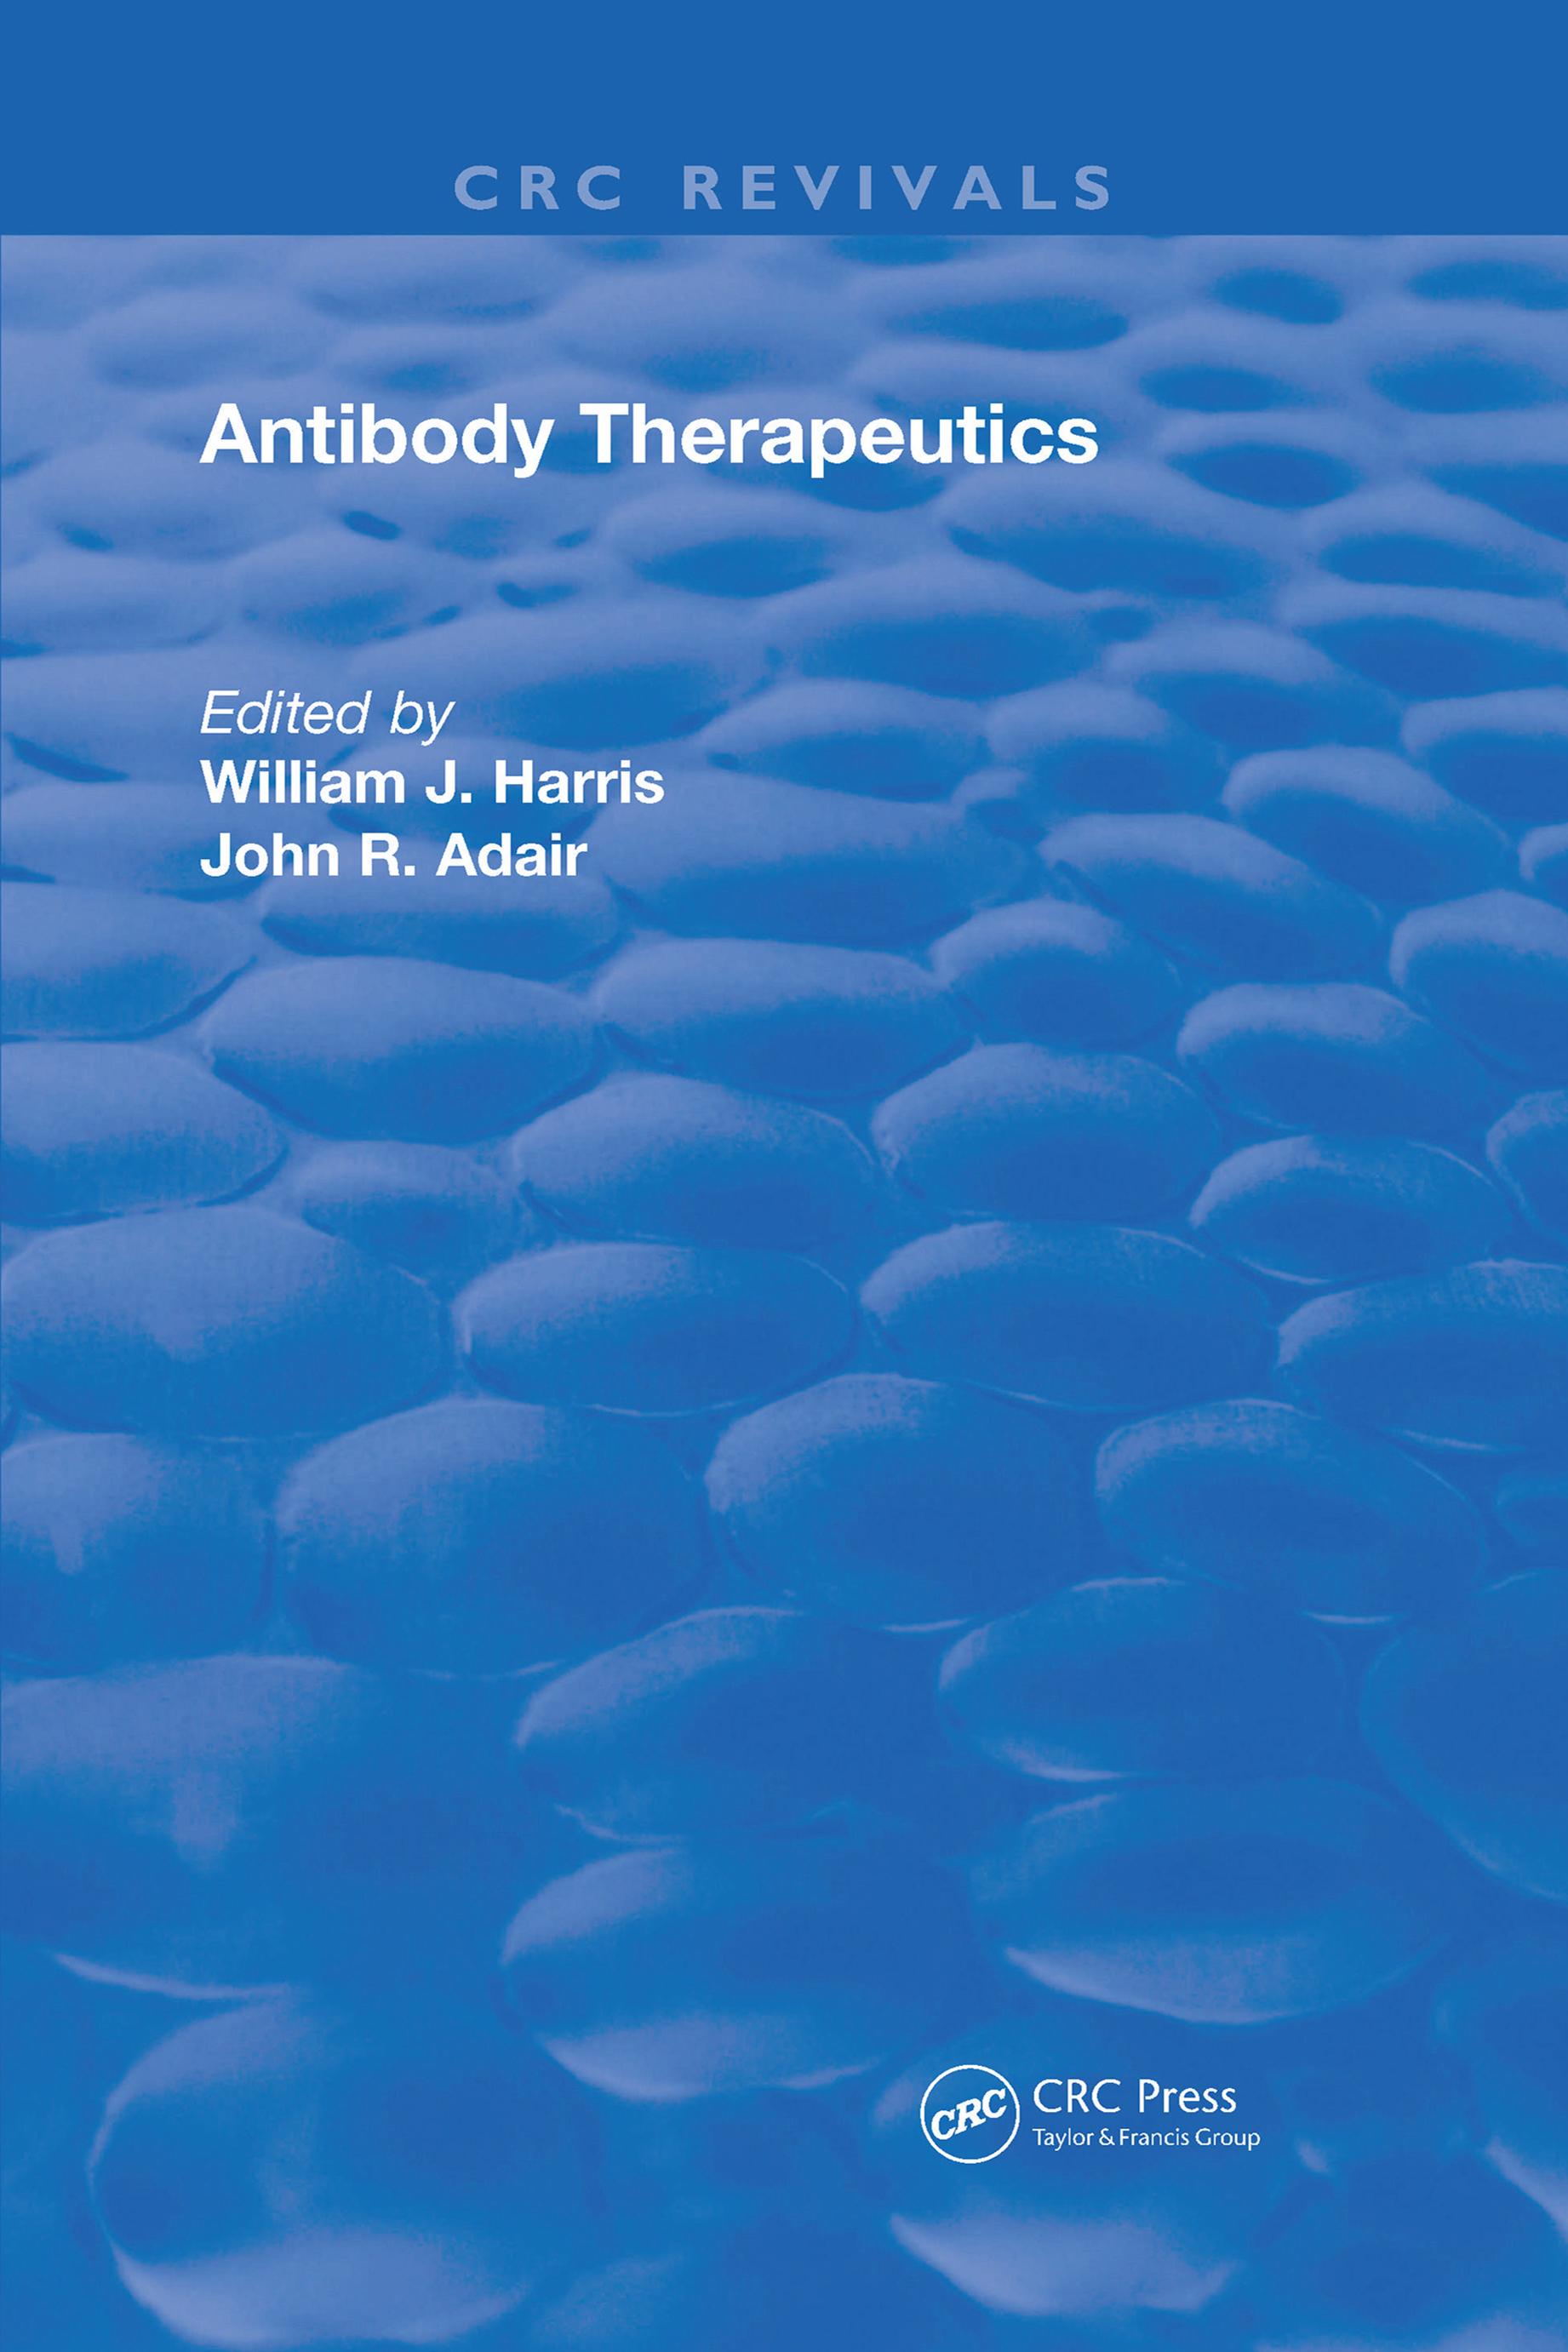 Regulatory Issues for the Development of Antibody Therapeutics